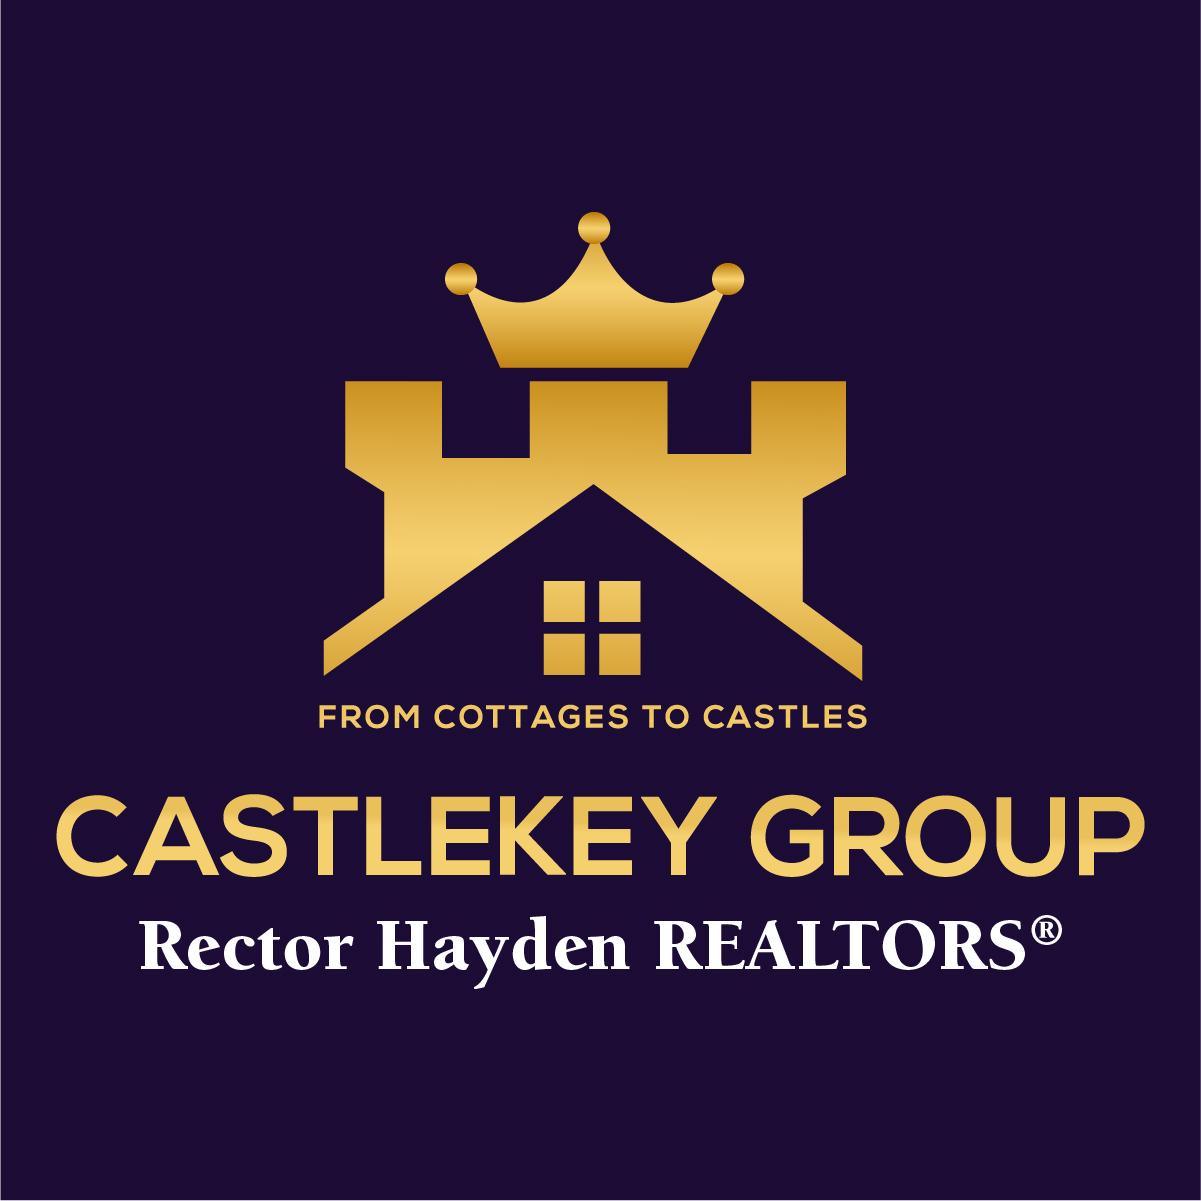 CastleKey Group